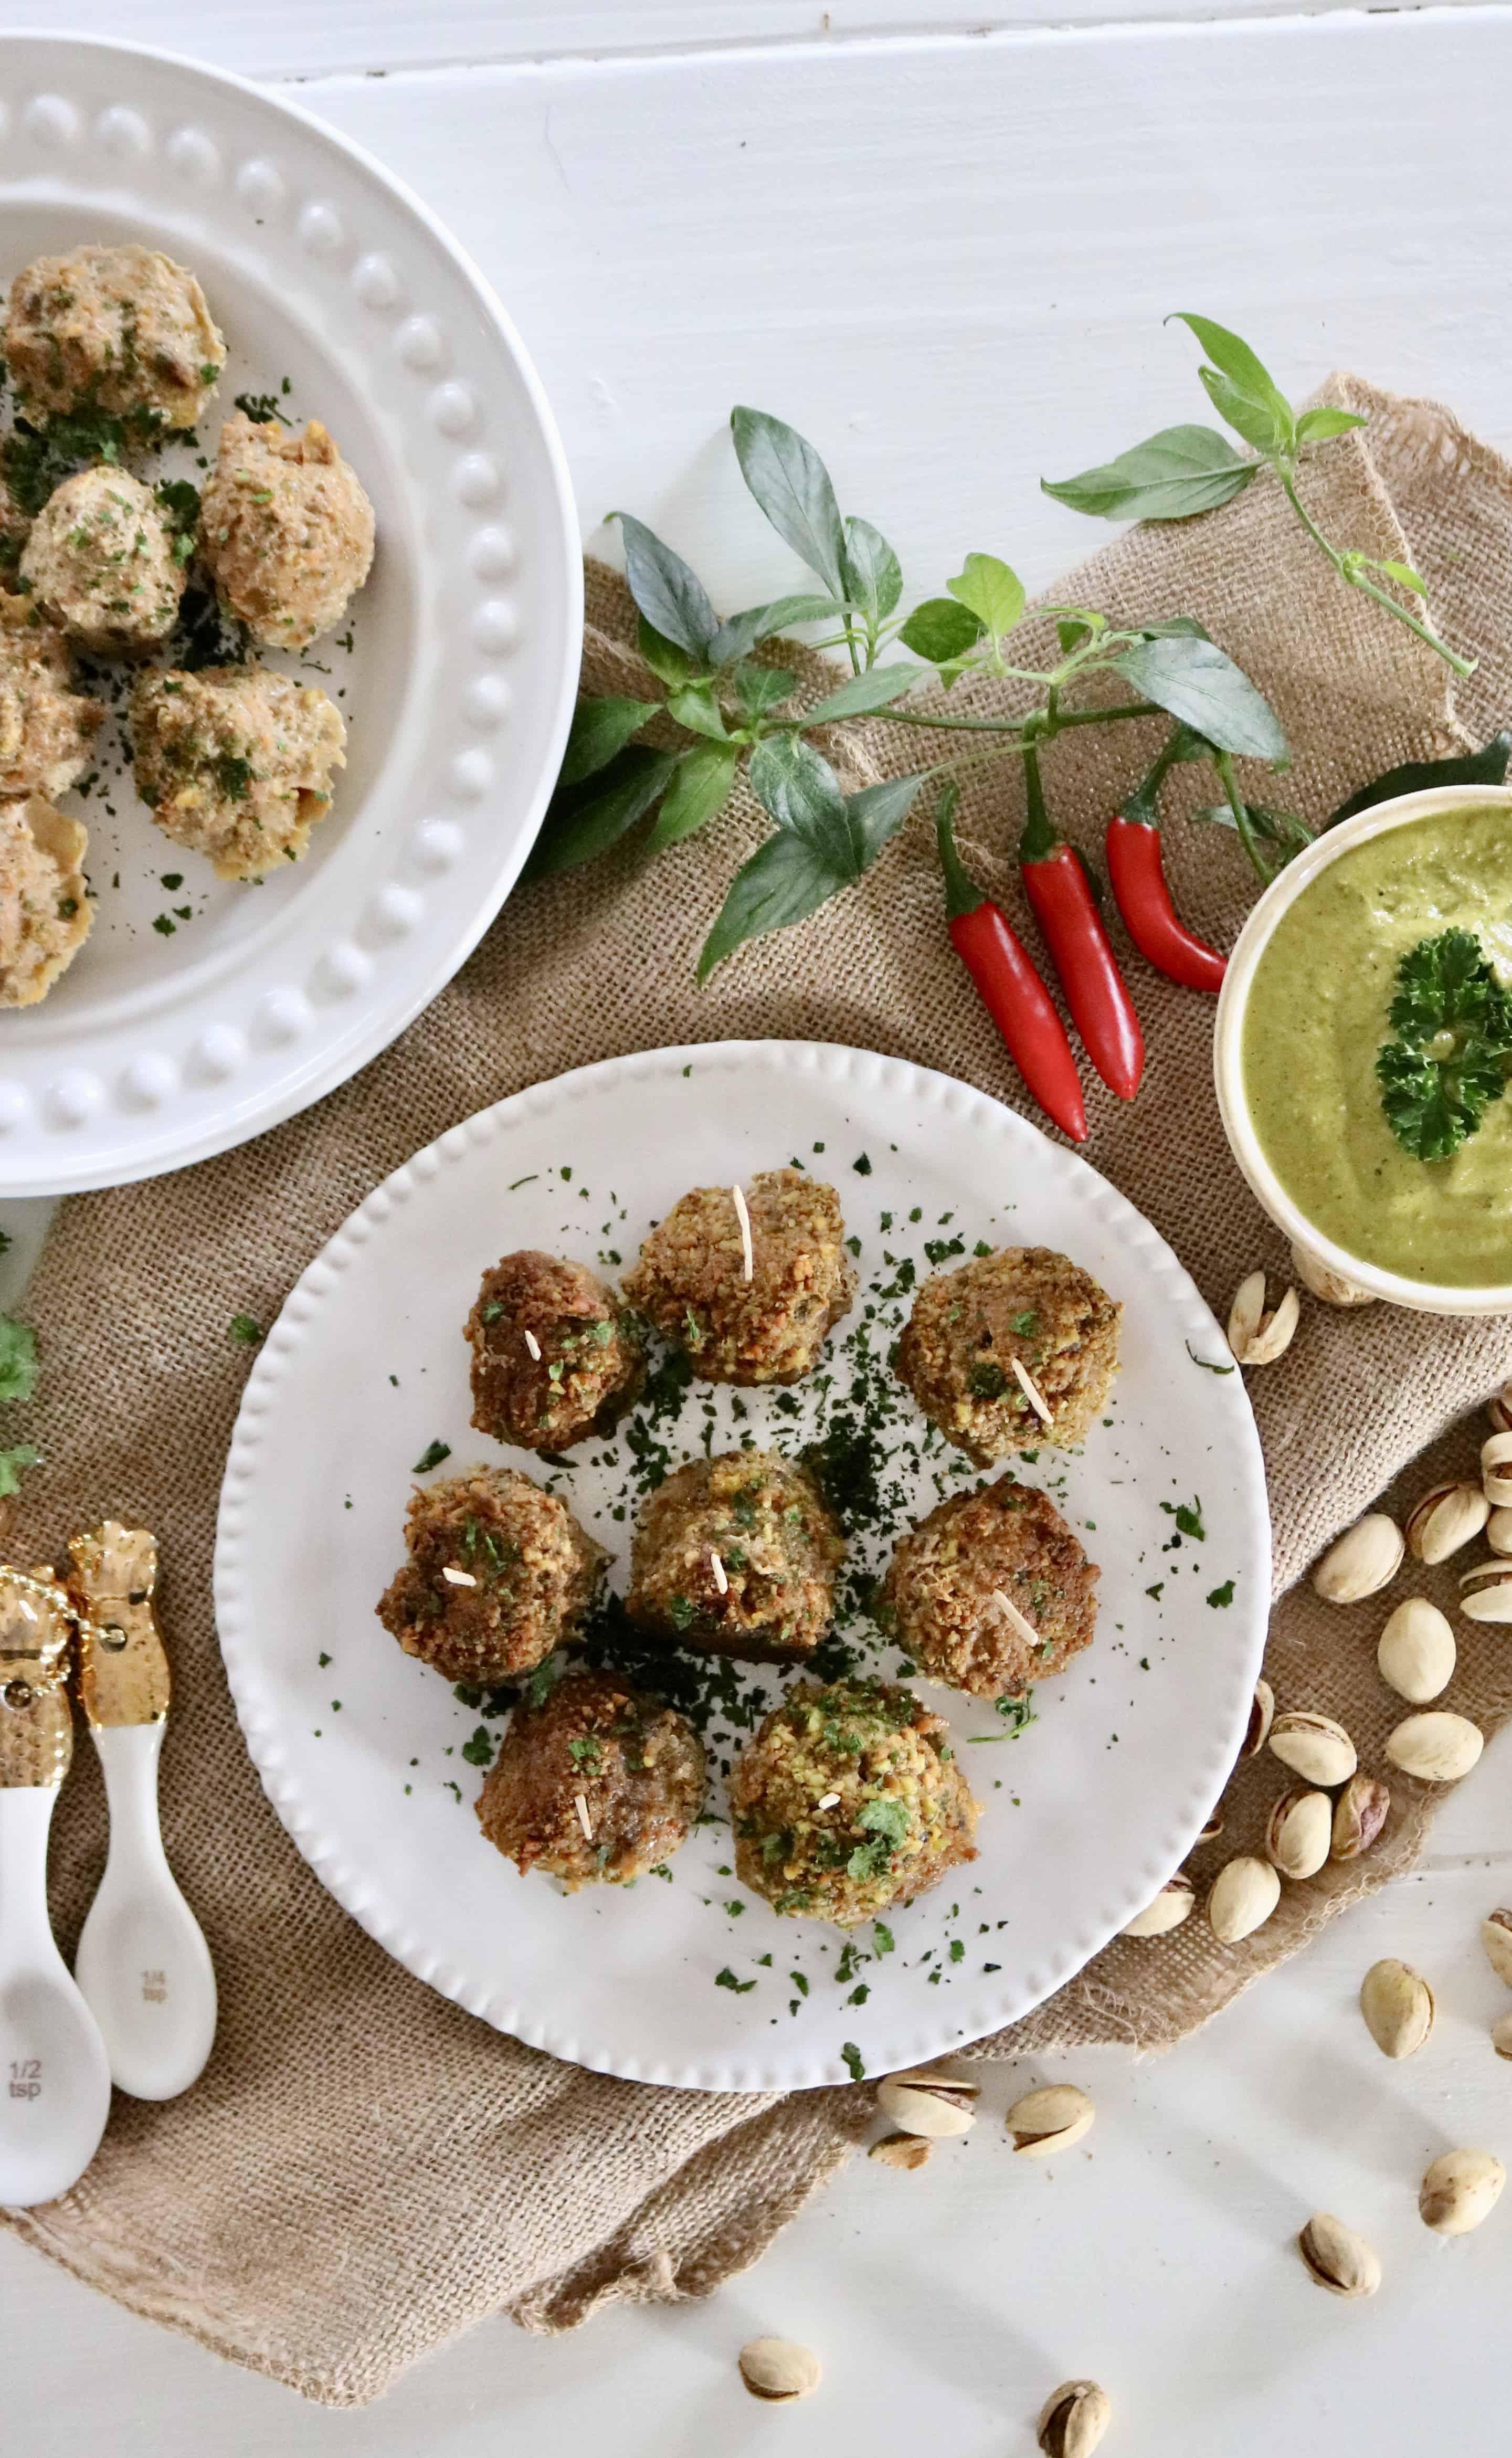 Pistachio Turkey Meatballs - Paleo, Gluten Free and 100% Yummy! @shawsimpleswaps